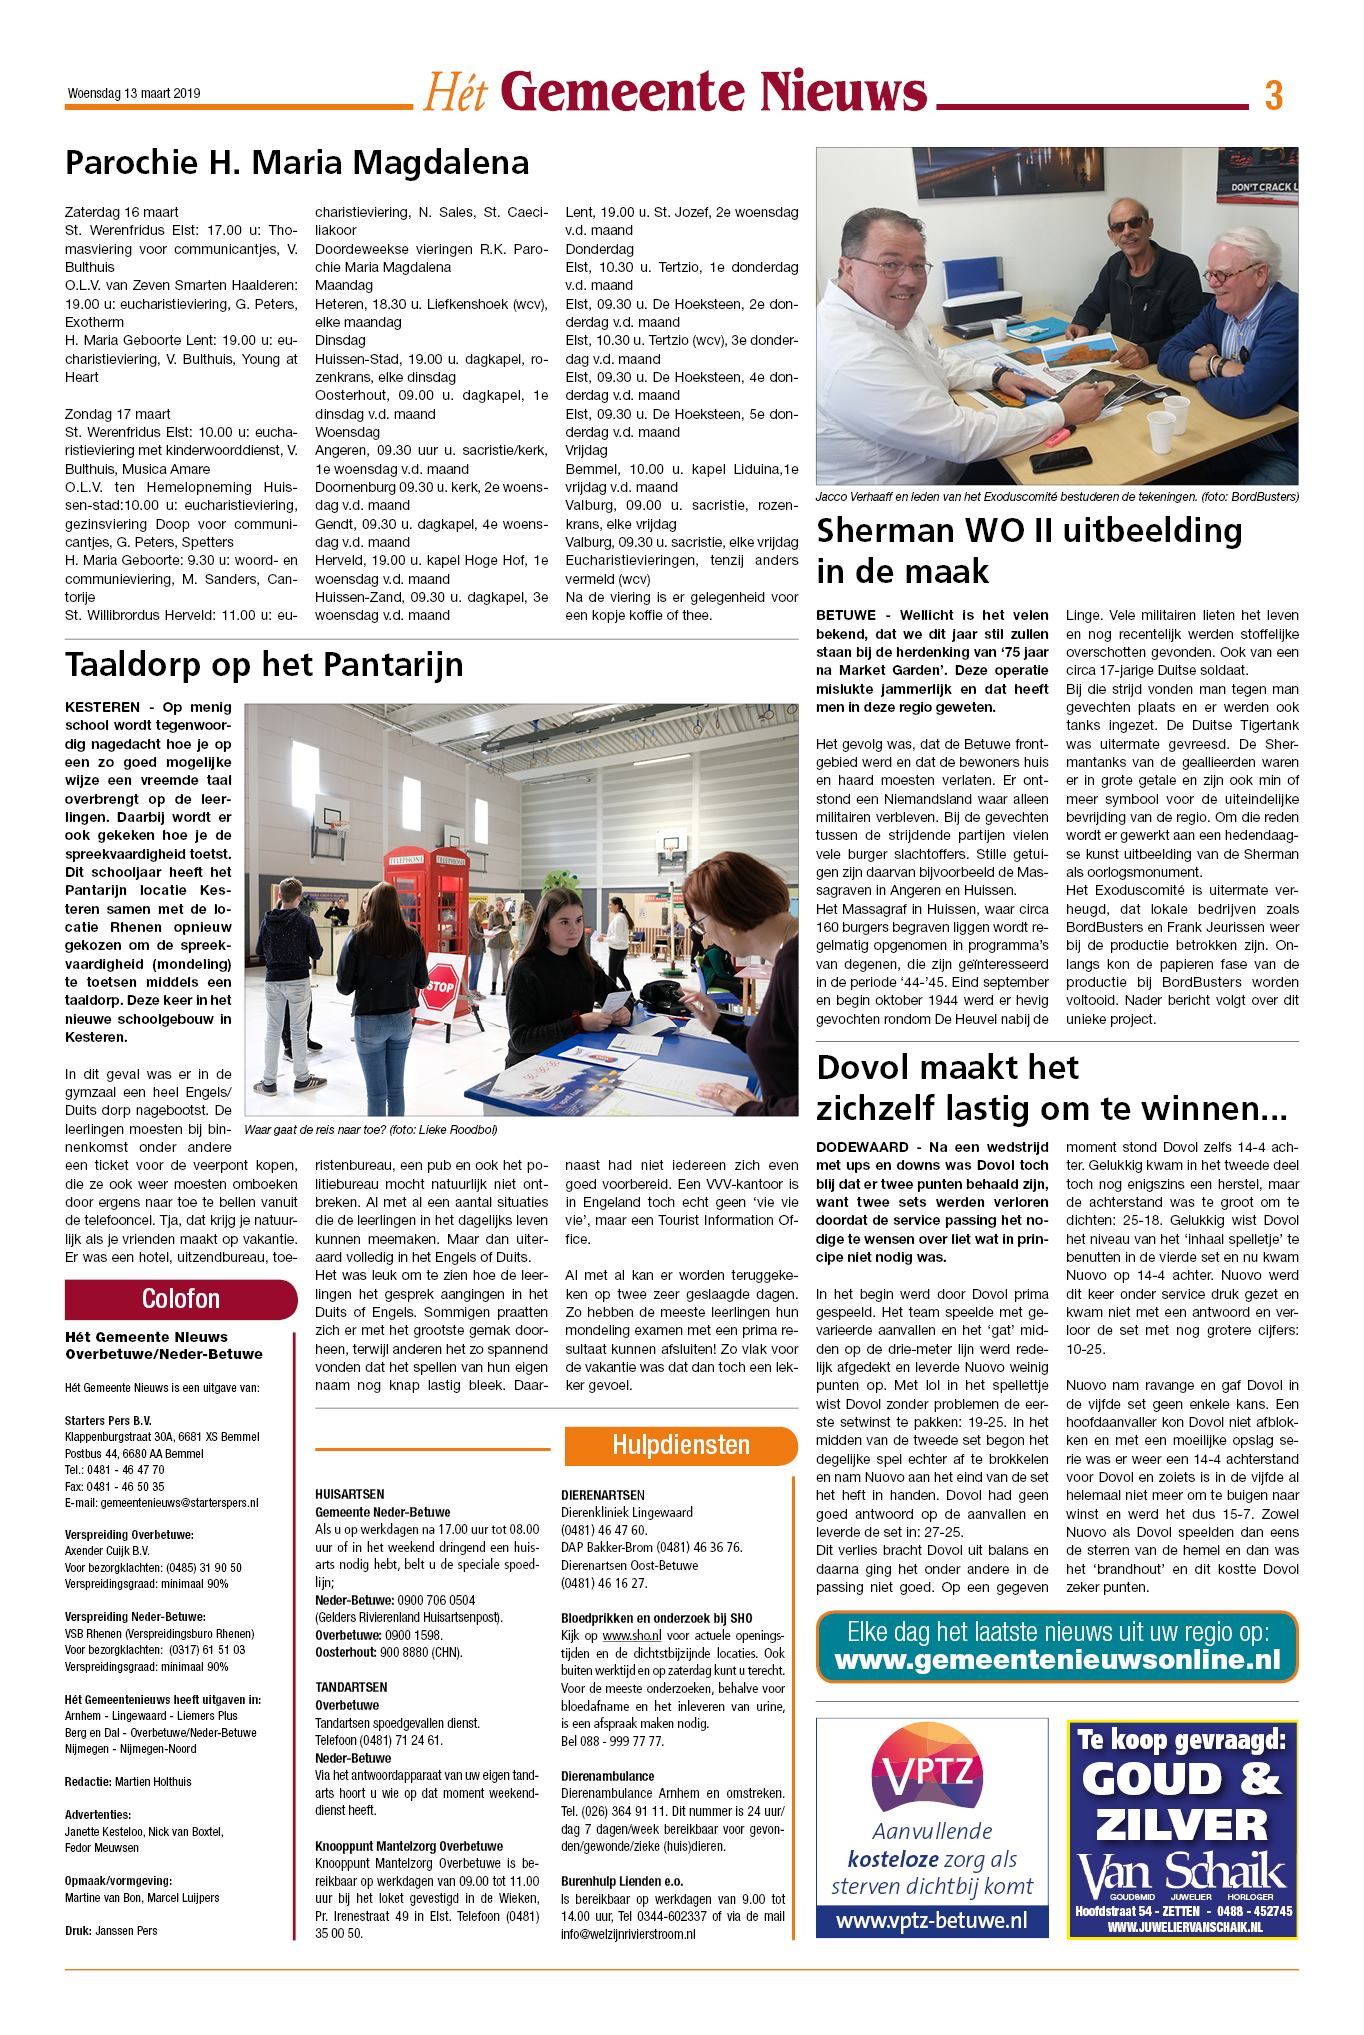 ffd590eefee GN Overbetuwe-Nederbetuwe 13 maart 2019